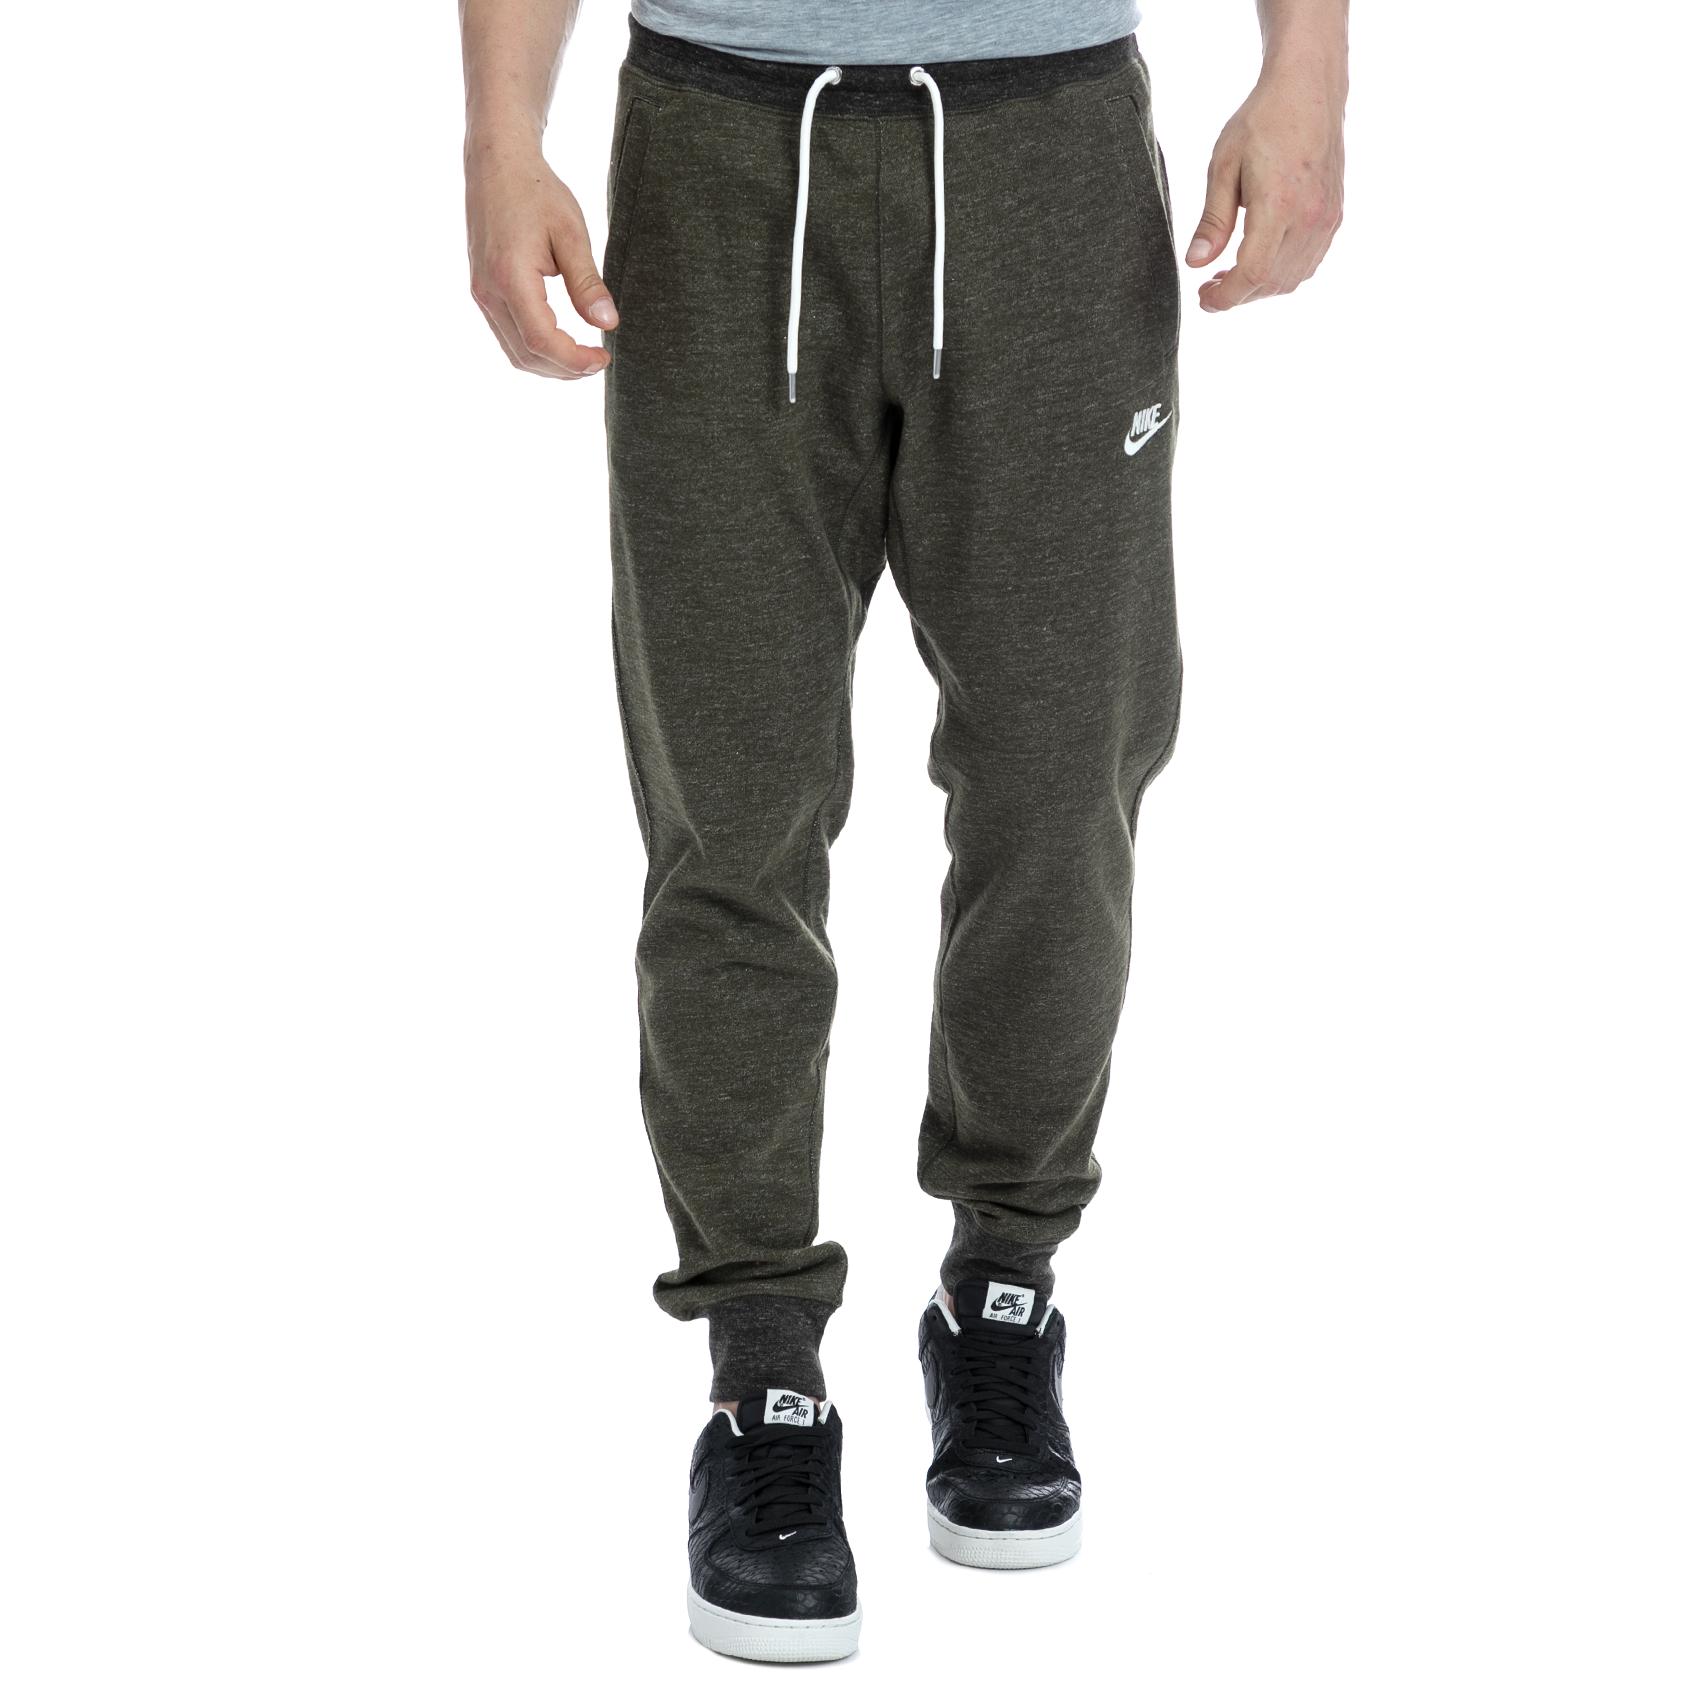 NIKE - Αντρικό παντελόνι NIKE χακί ανδρικά ρούχα αθλητικά φόρμες